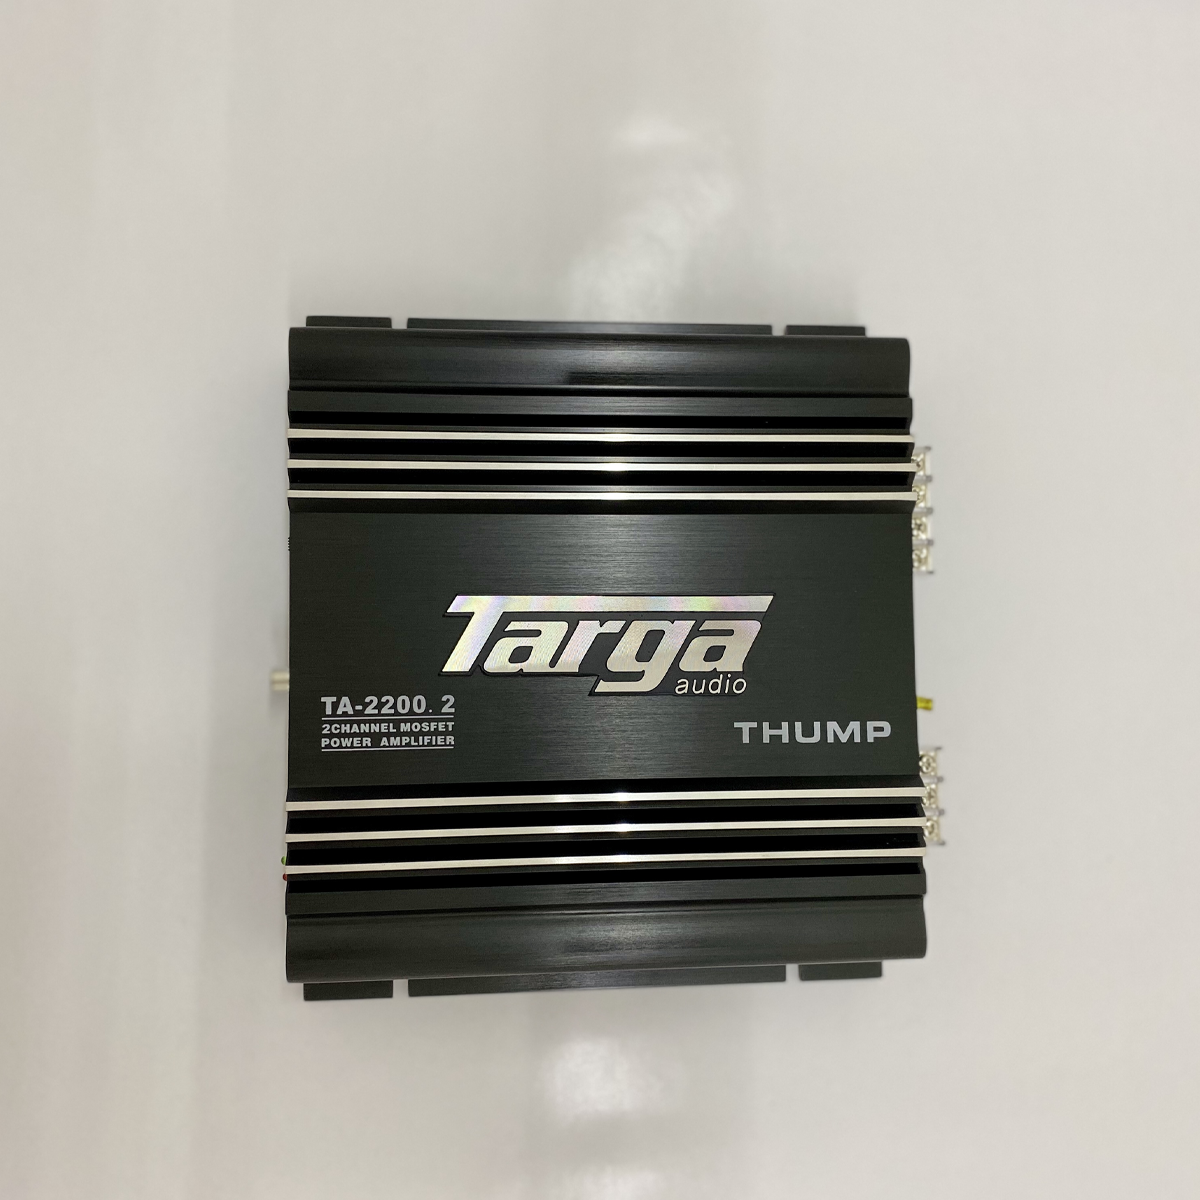 TA-2200-3